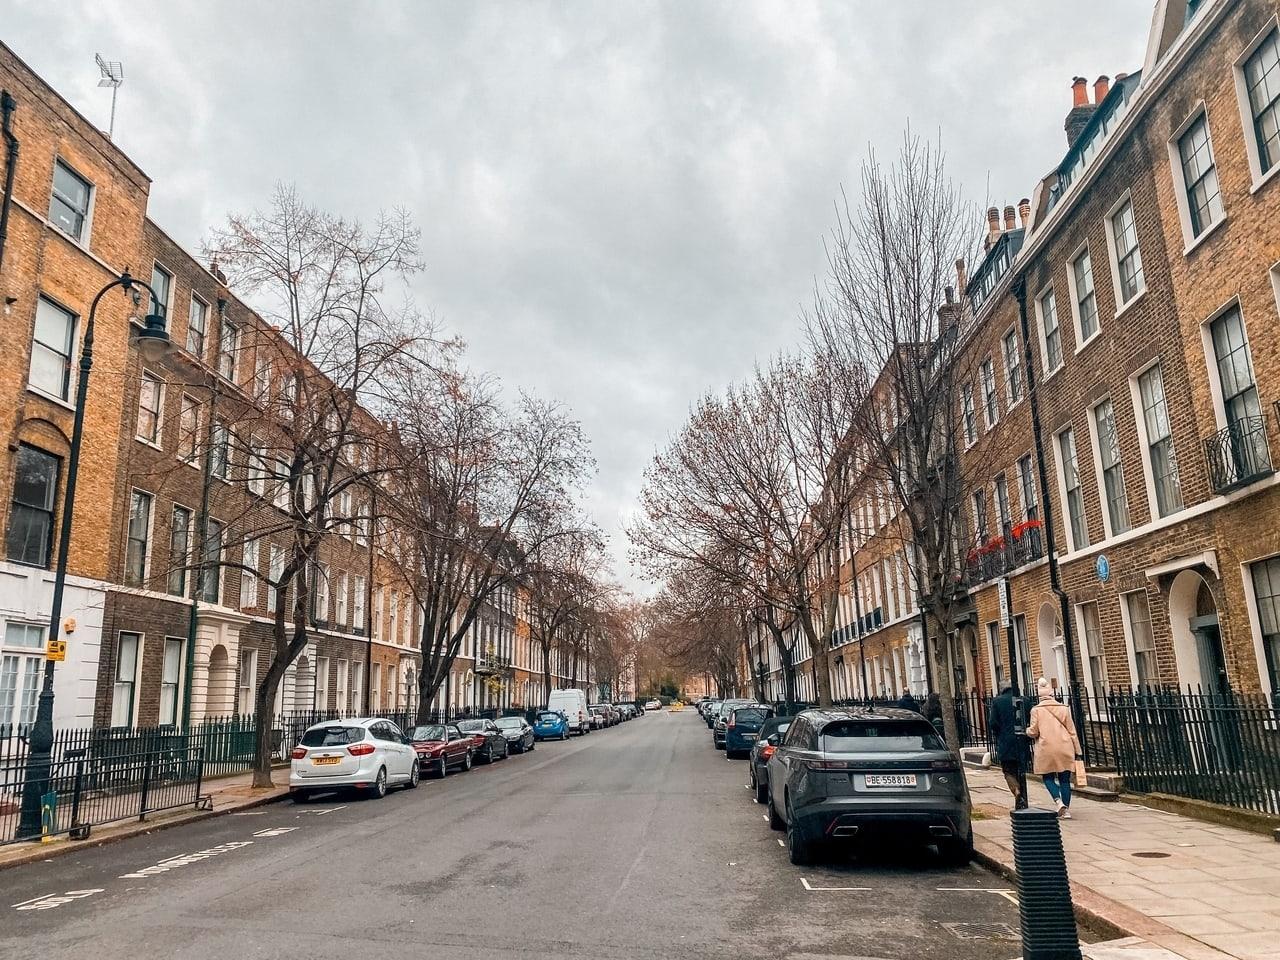 Doughty Street in Holborn London